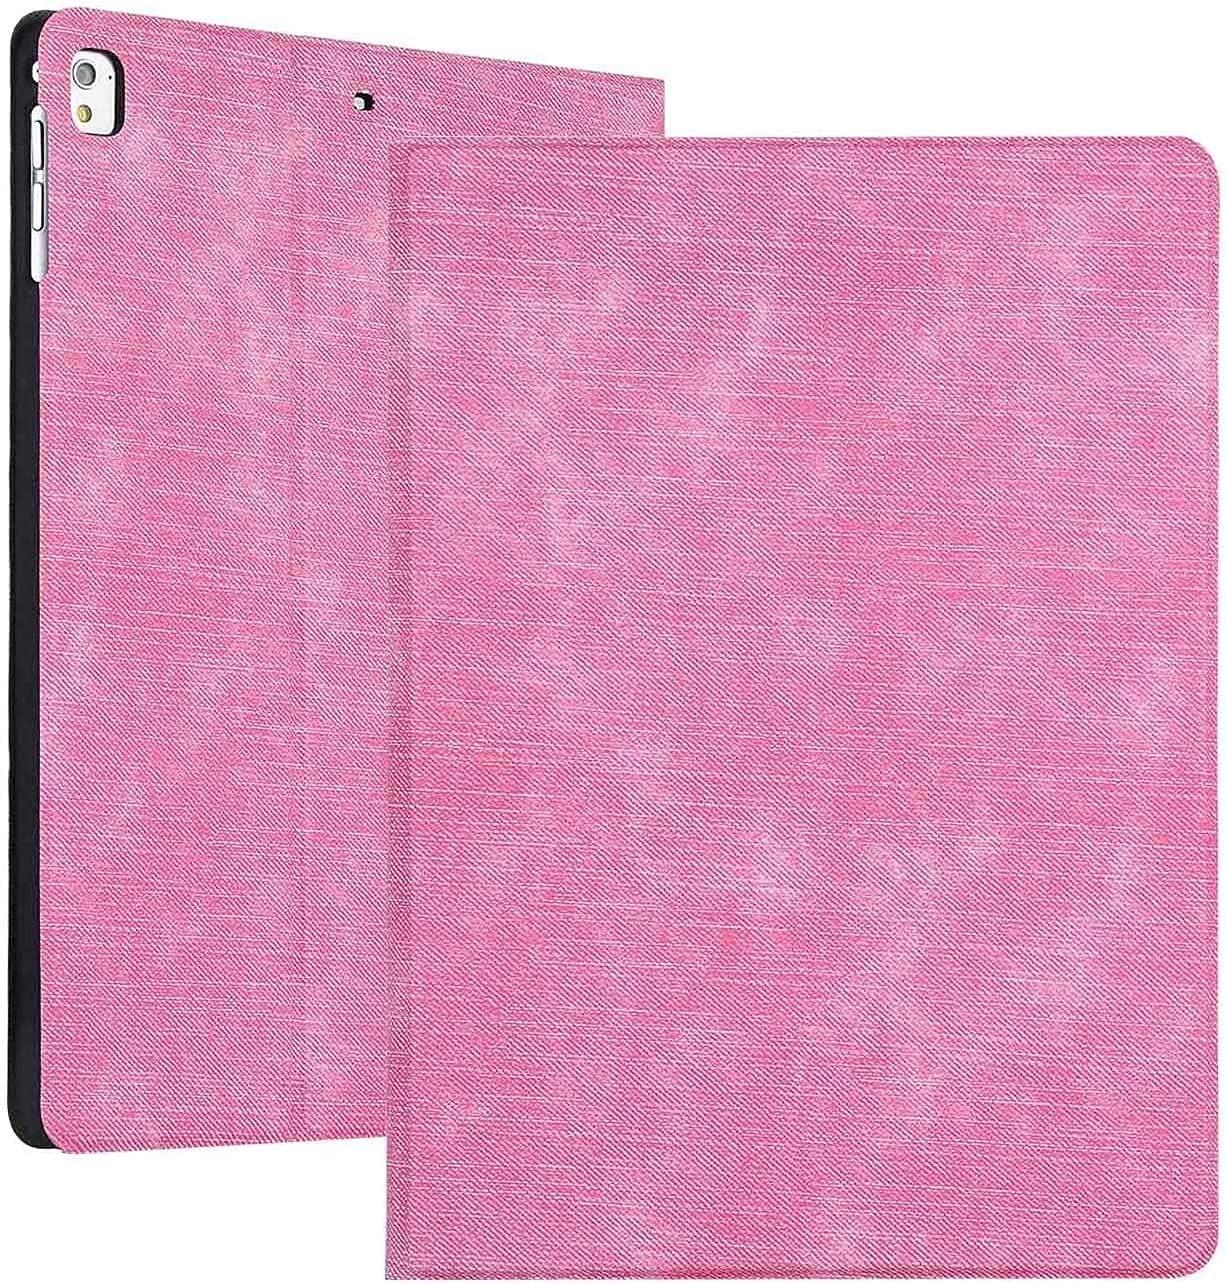 YIU Case Year-end gift for iPad Mini 5 Cover Stan Multi-Angle Smart Protective San Jose Mall